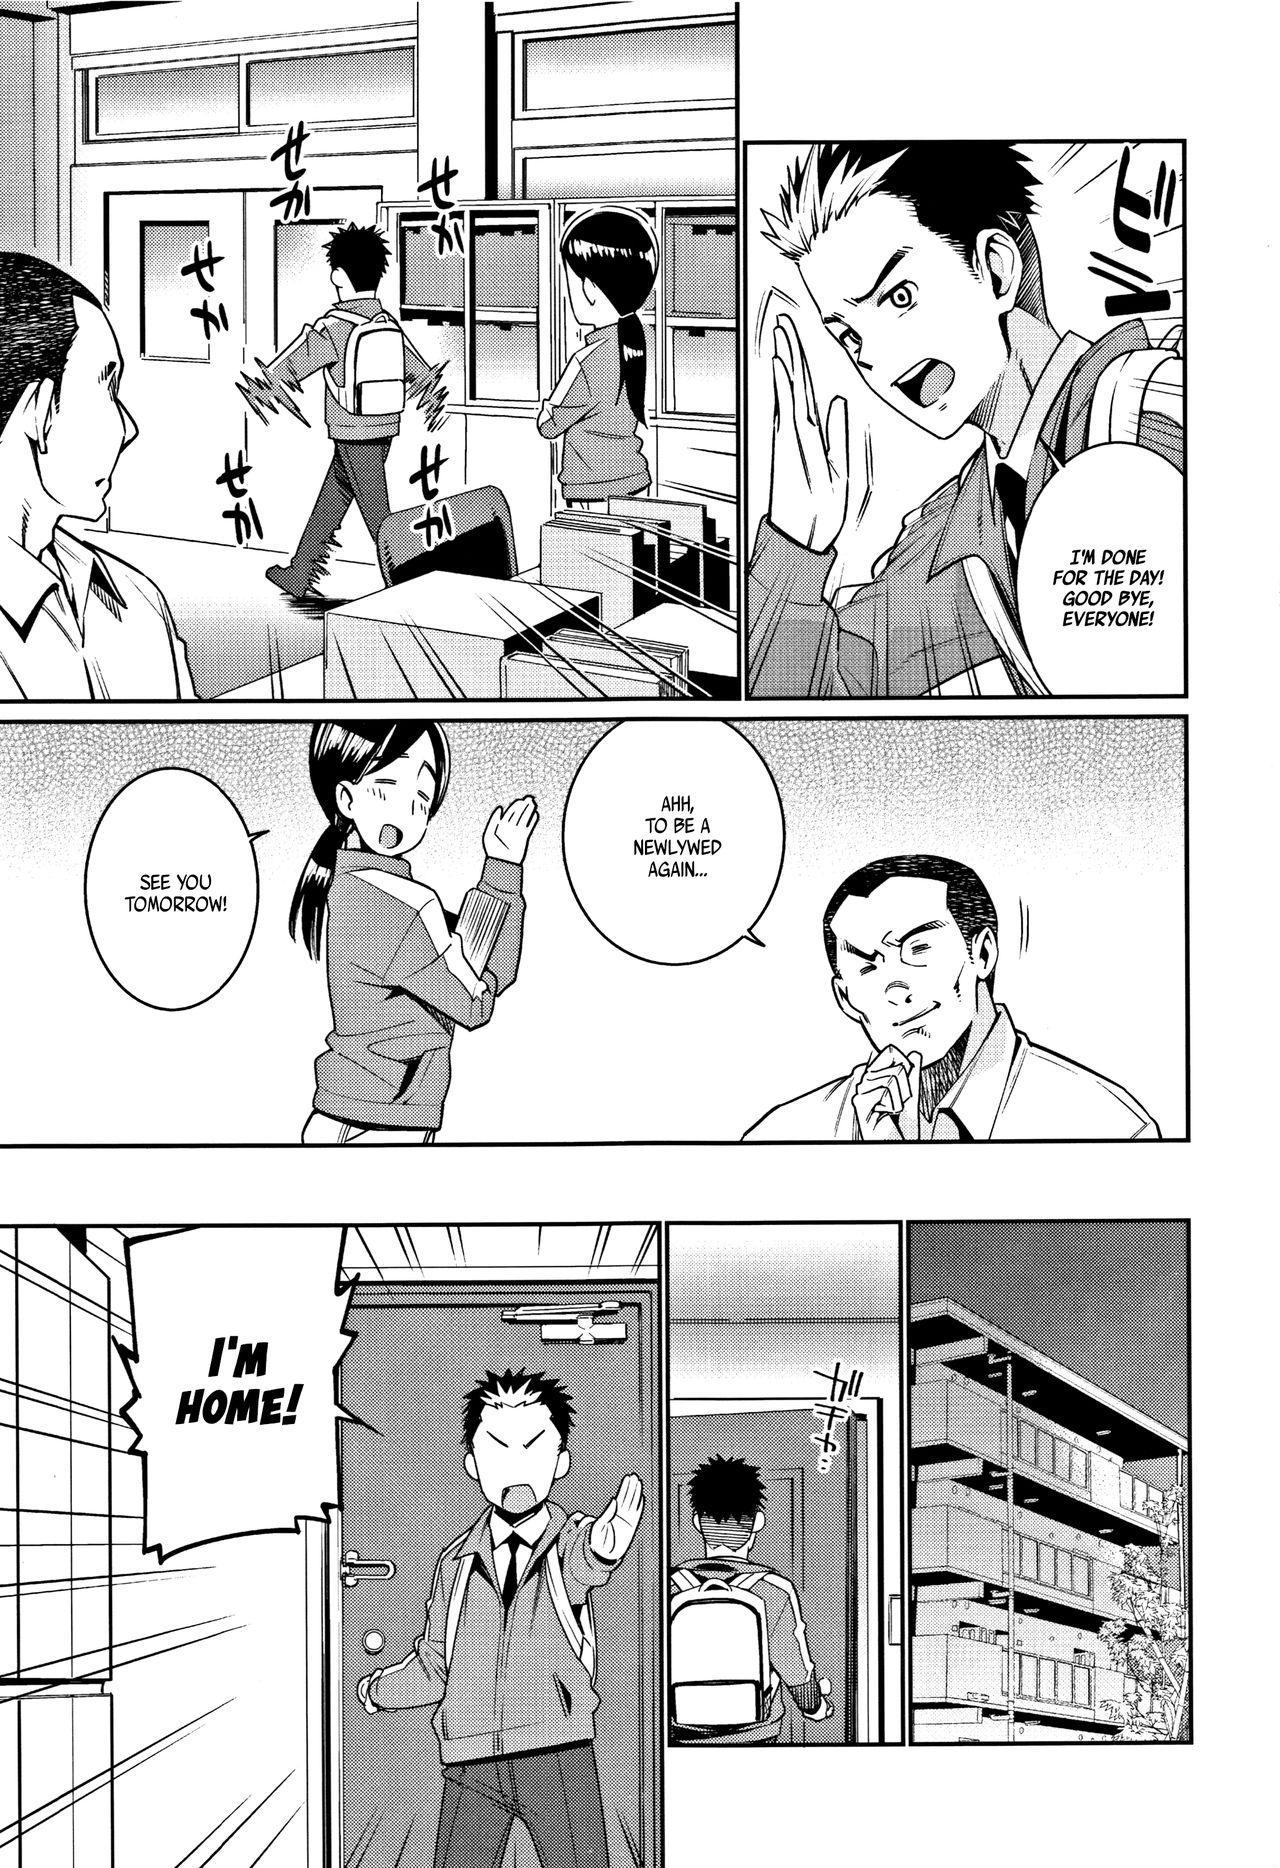 [Gengorou] Shoujo Konkatsu Jidai -Looking for the one- Ch. 1-6 [English] 90